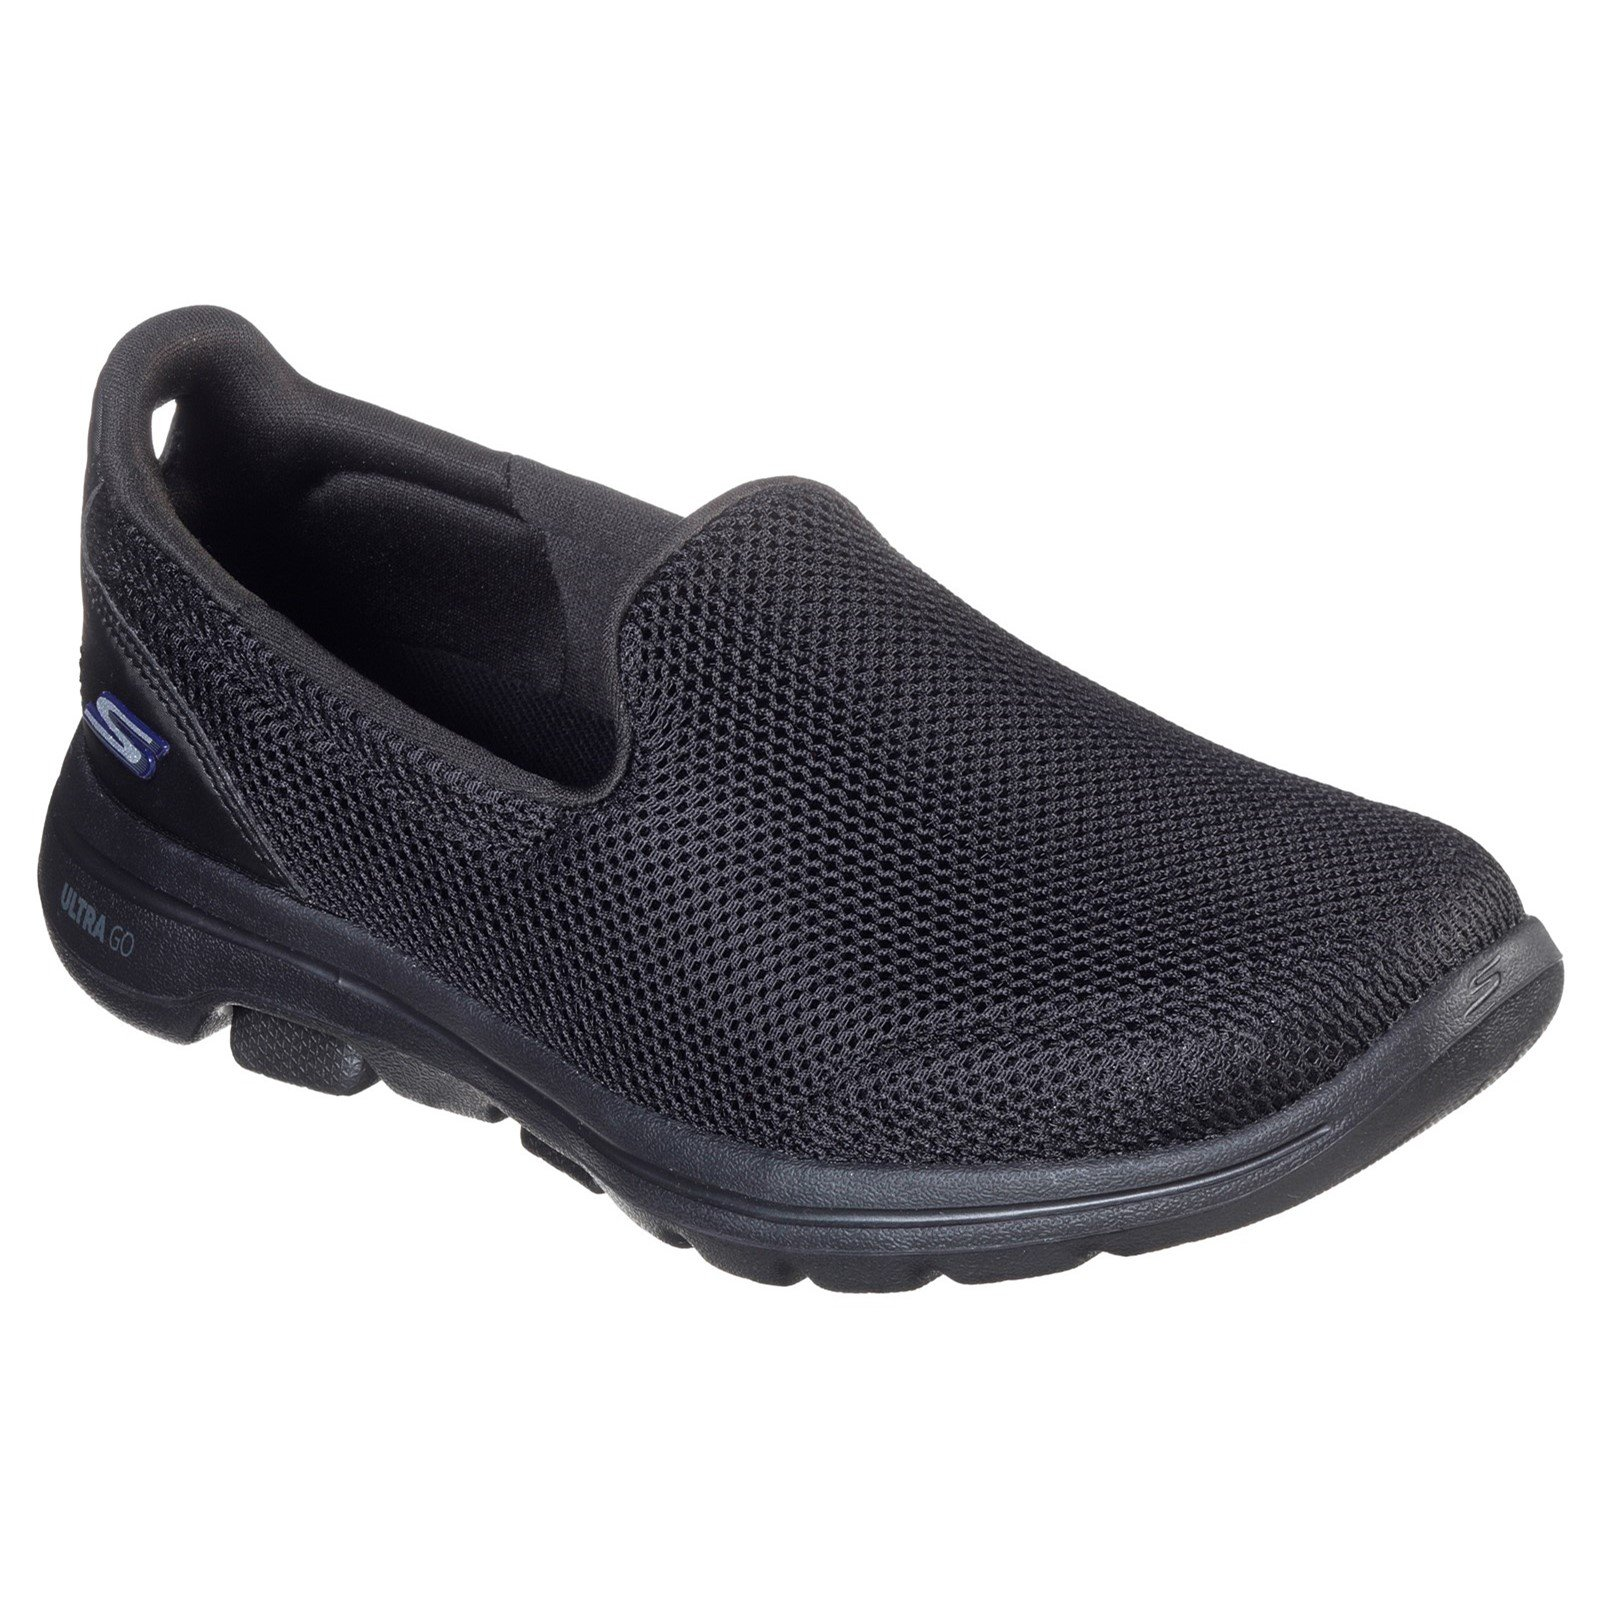 Skechers Women's Go Walk 5 Wide Trainer Various Colours 33061 - Black 4